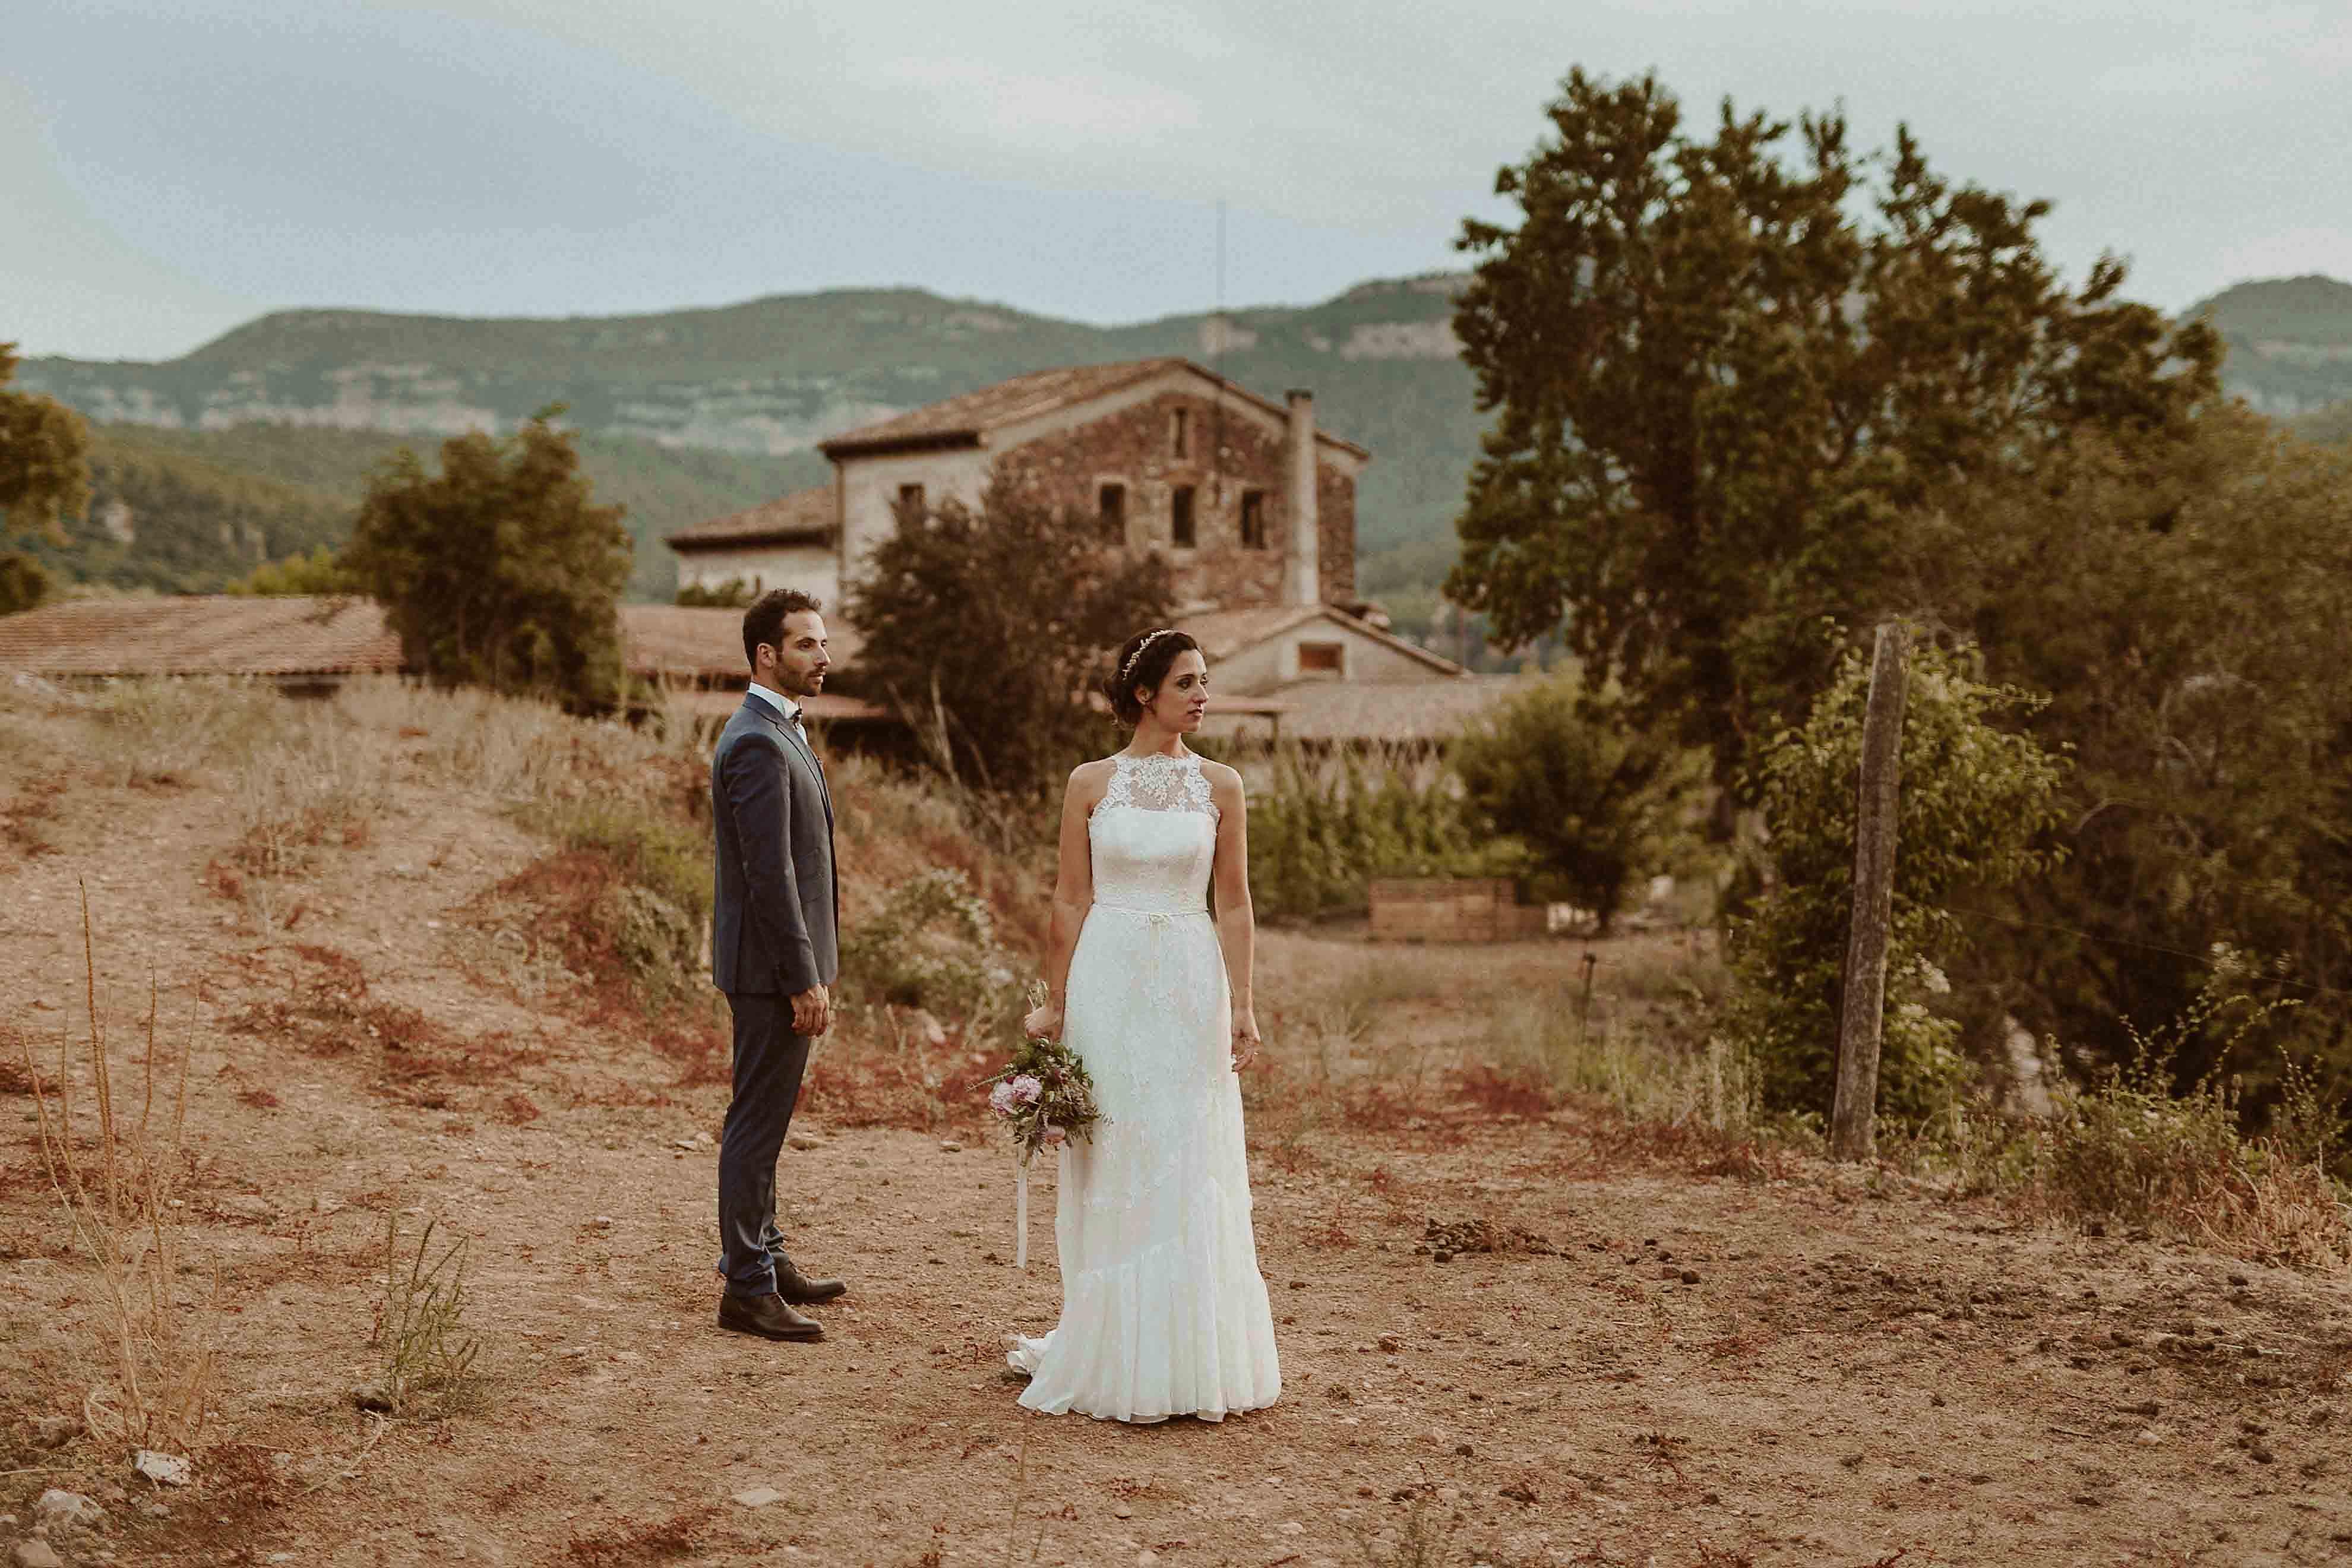 Boda rústica en la montaña. fotgrafo de bodas barcelona_085